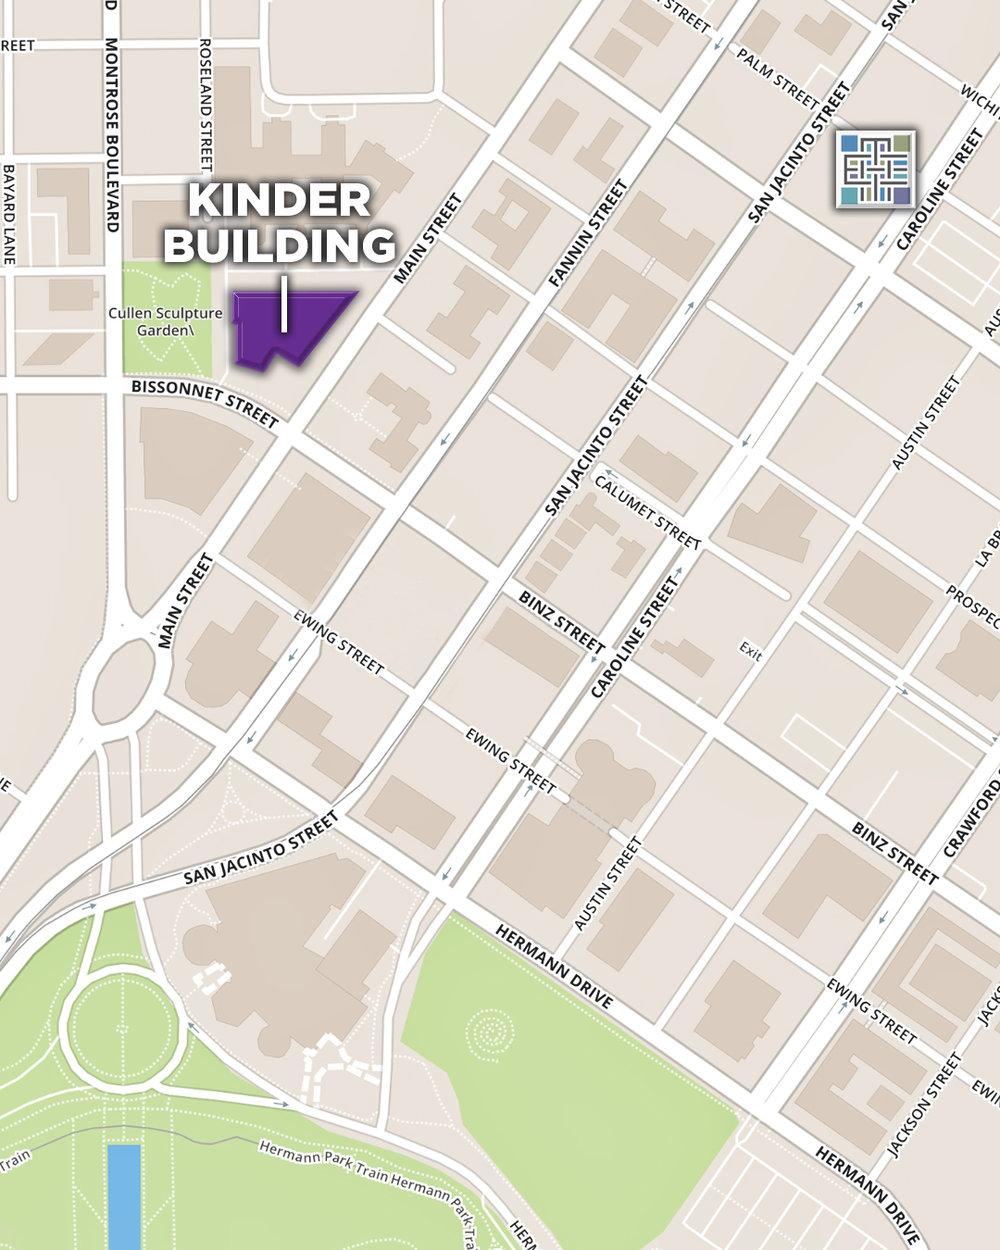 Kinder_Building_1080x1350-5.jpg